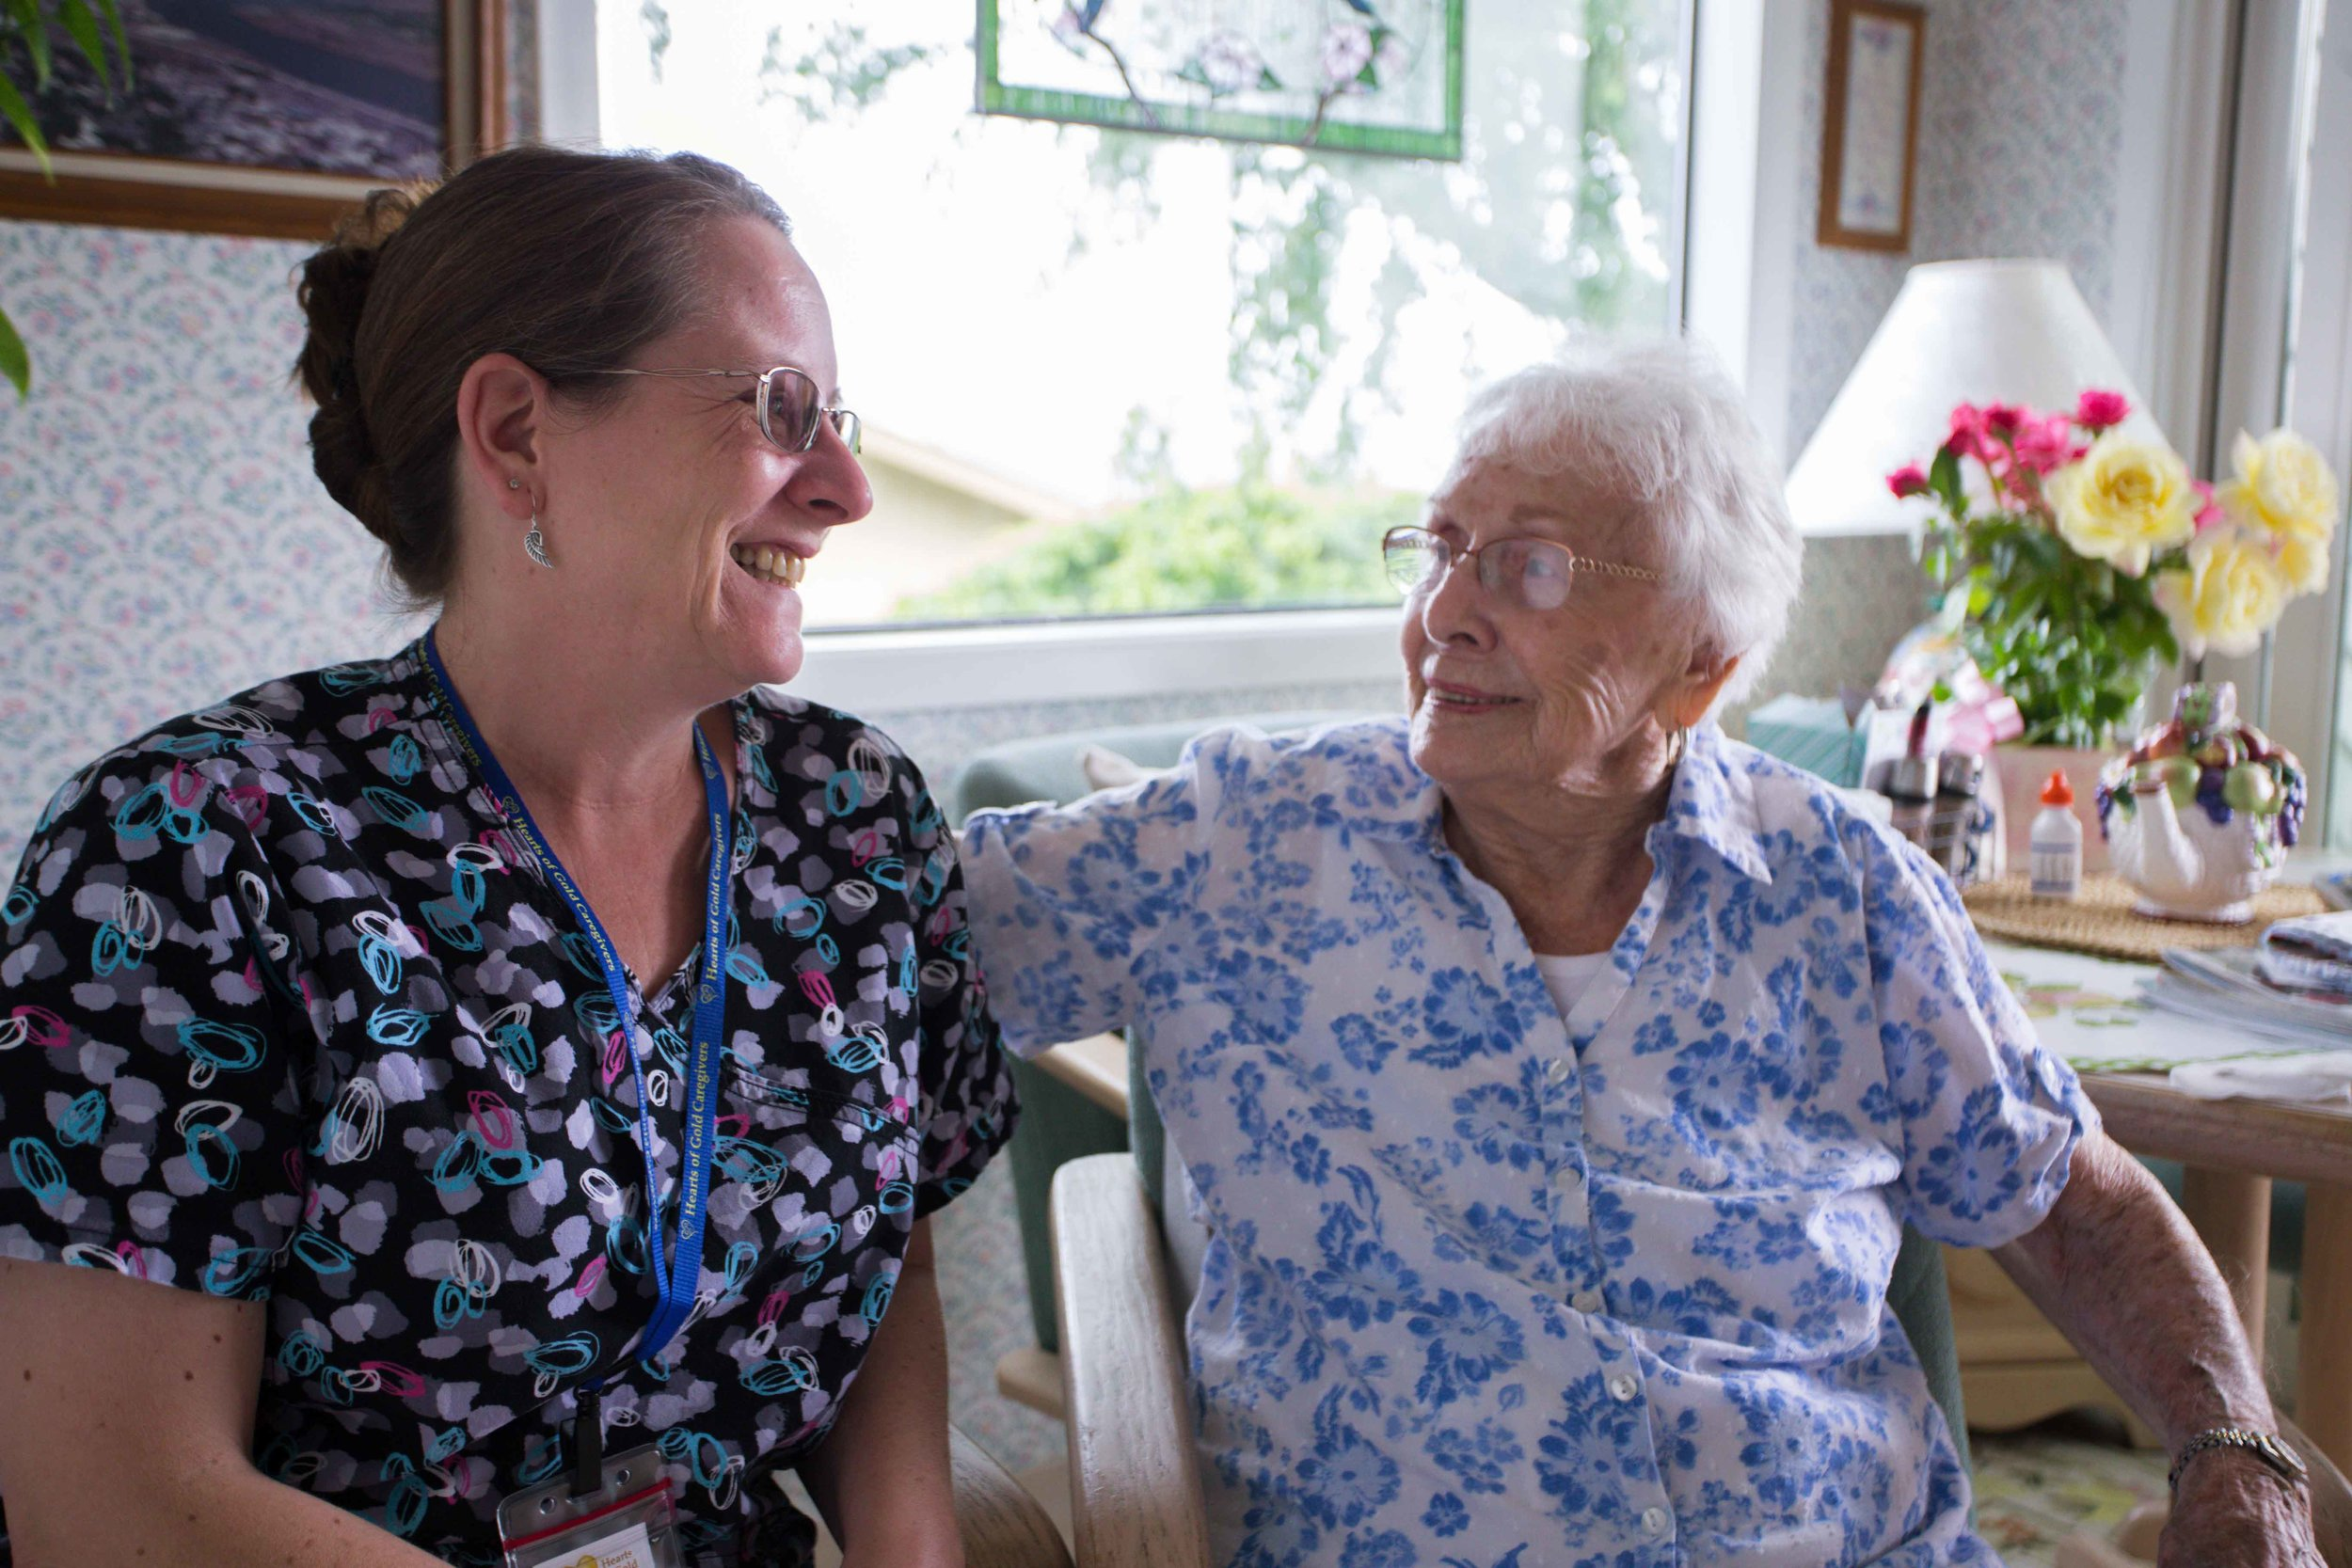 HeartsofGold hood river columbia gorge the dalles oregon caregiving at home care seniors nurses exports photos smiles happy sunshine time-35.jpg